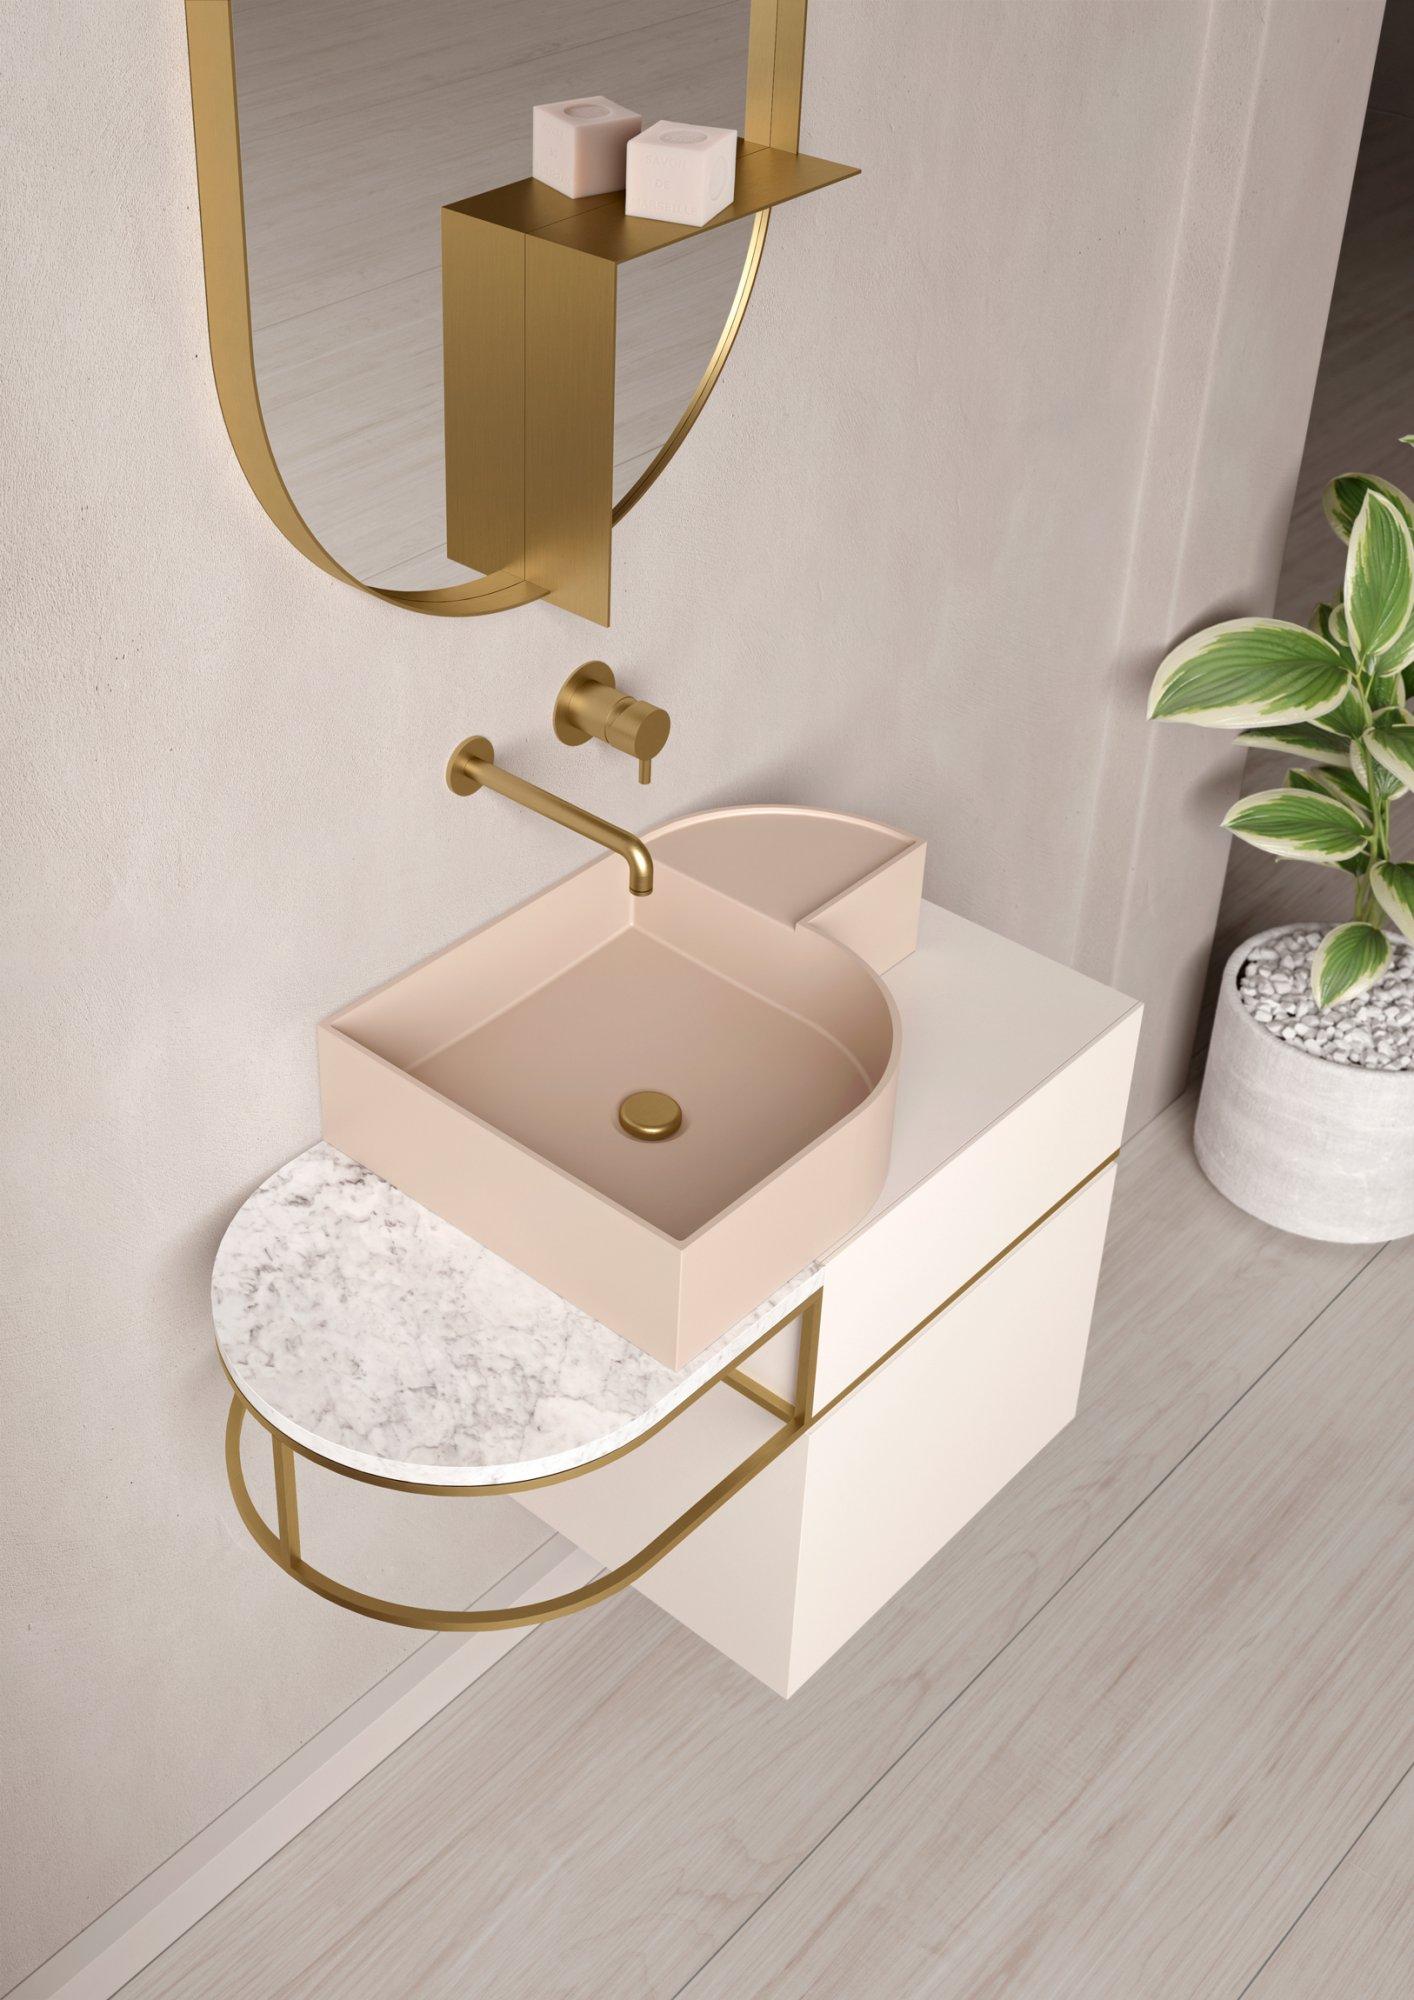 West One Bathrooms Sheerluxe EXt Basin 02